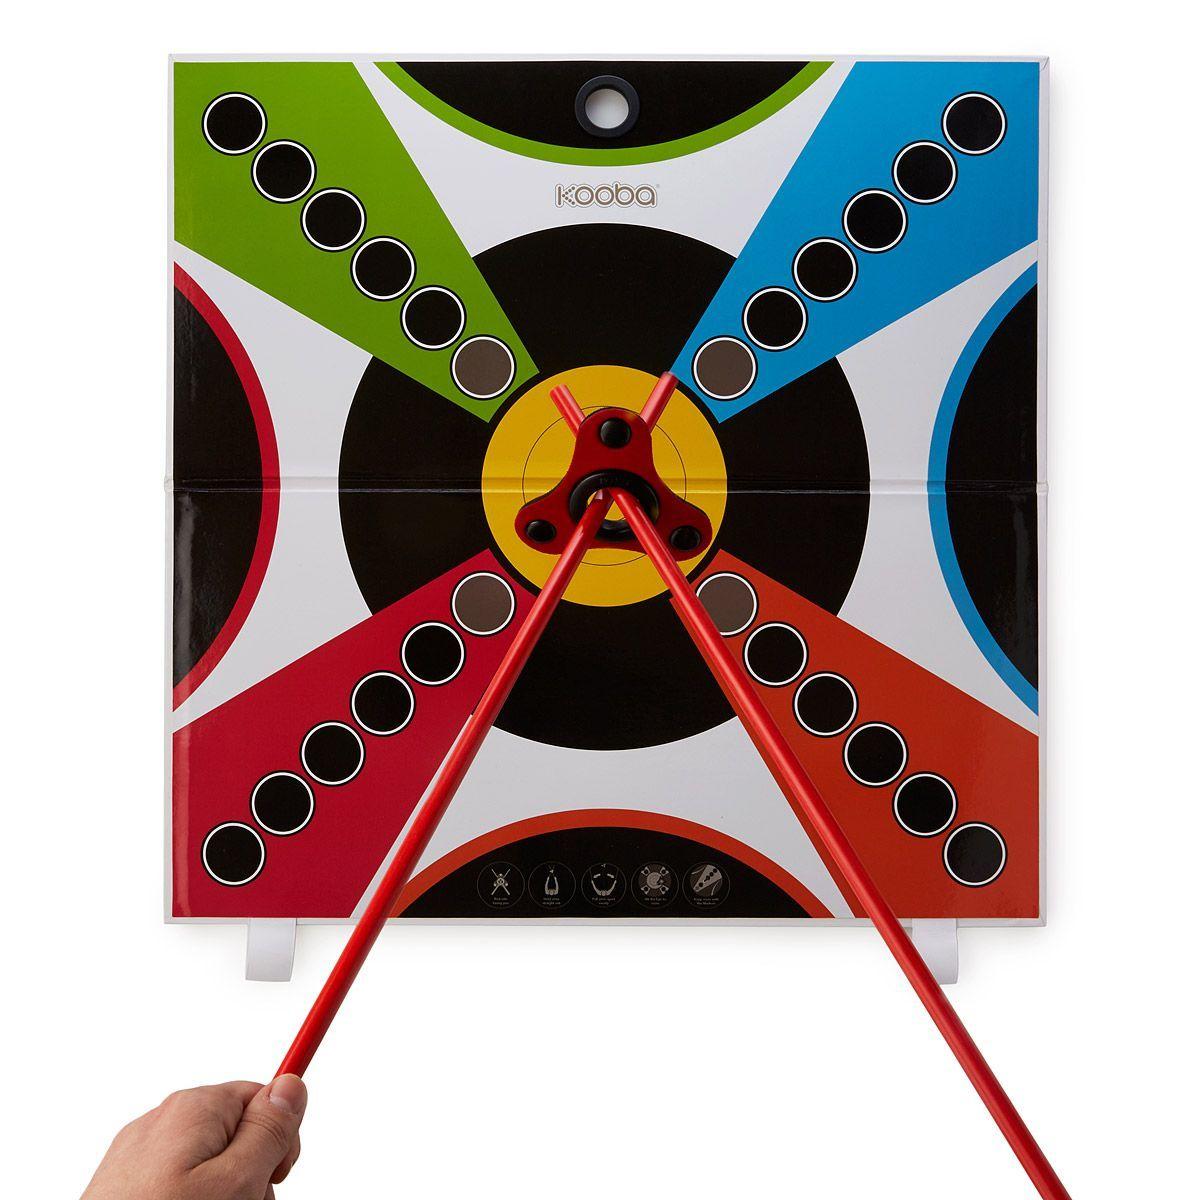 Kooba target game creative dart board game